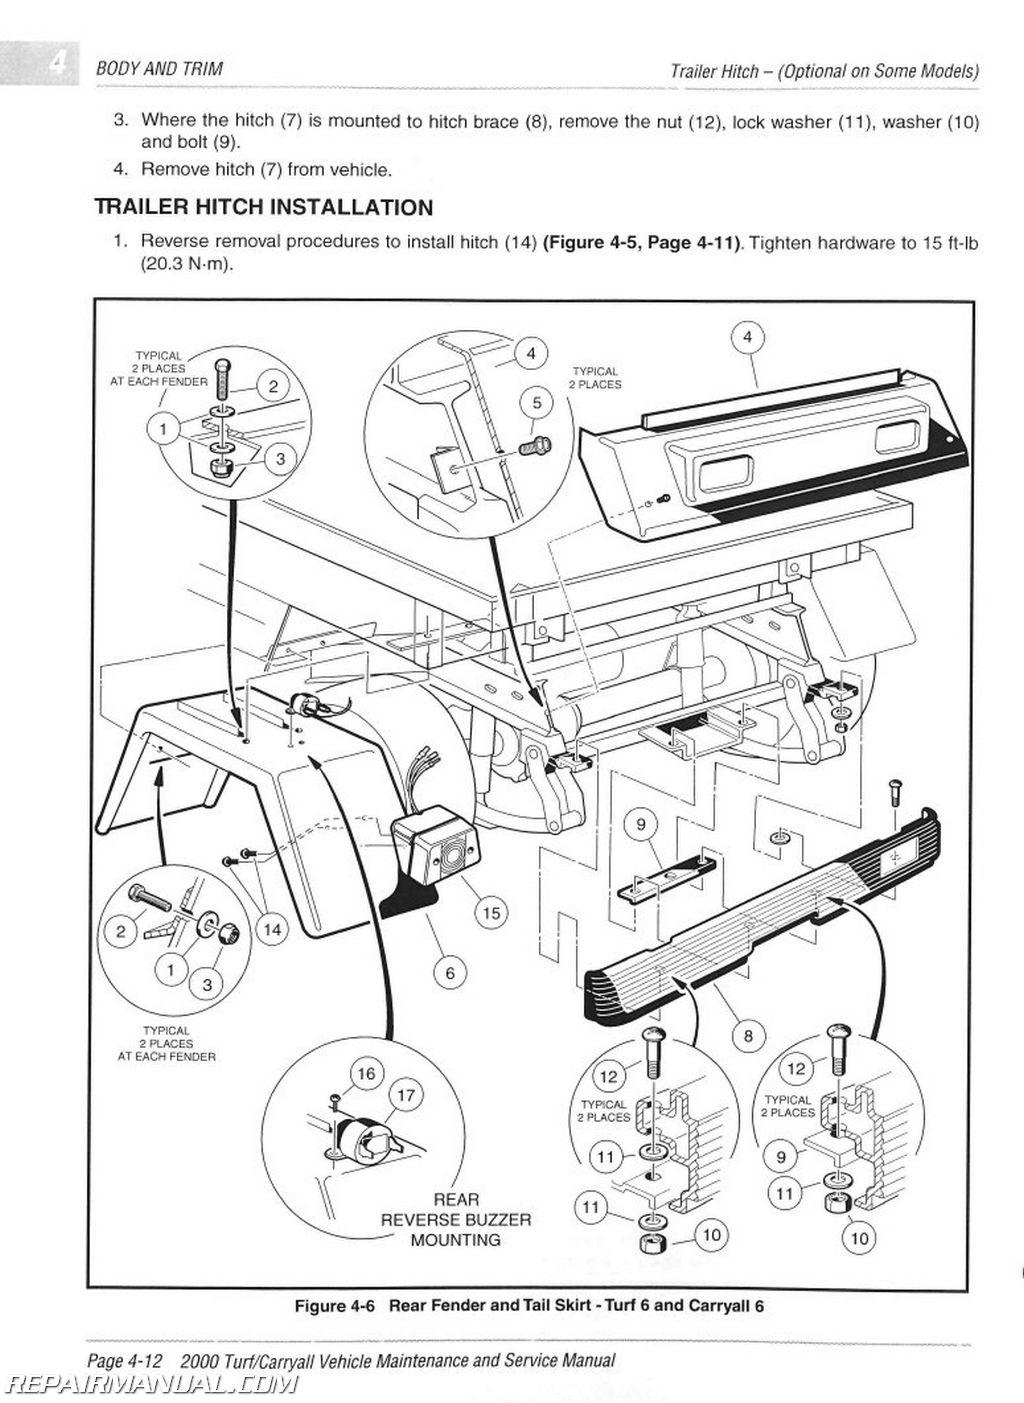 Club Car Manual Wire Diagrams Circuit Diagram Schematic 1996 48 Volt Wiring 2005 Ds Parts Pdf Viewmotorjdi Org